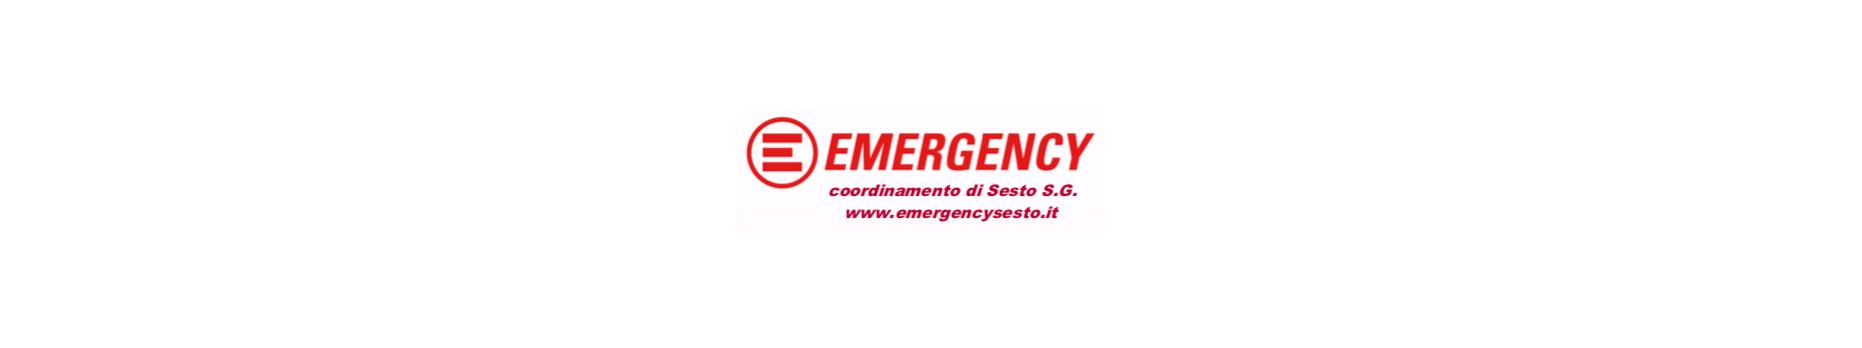 Associazione Emergency ONG ONLUS Coordinamento Sesto - logo